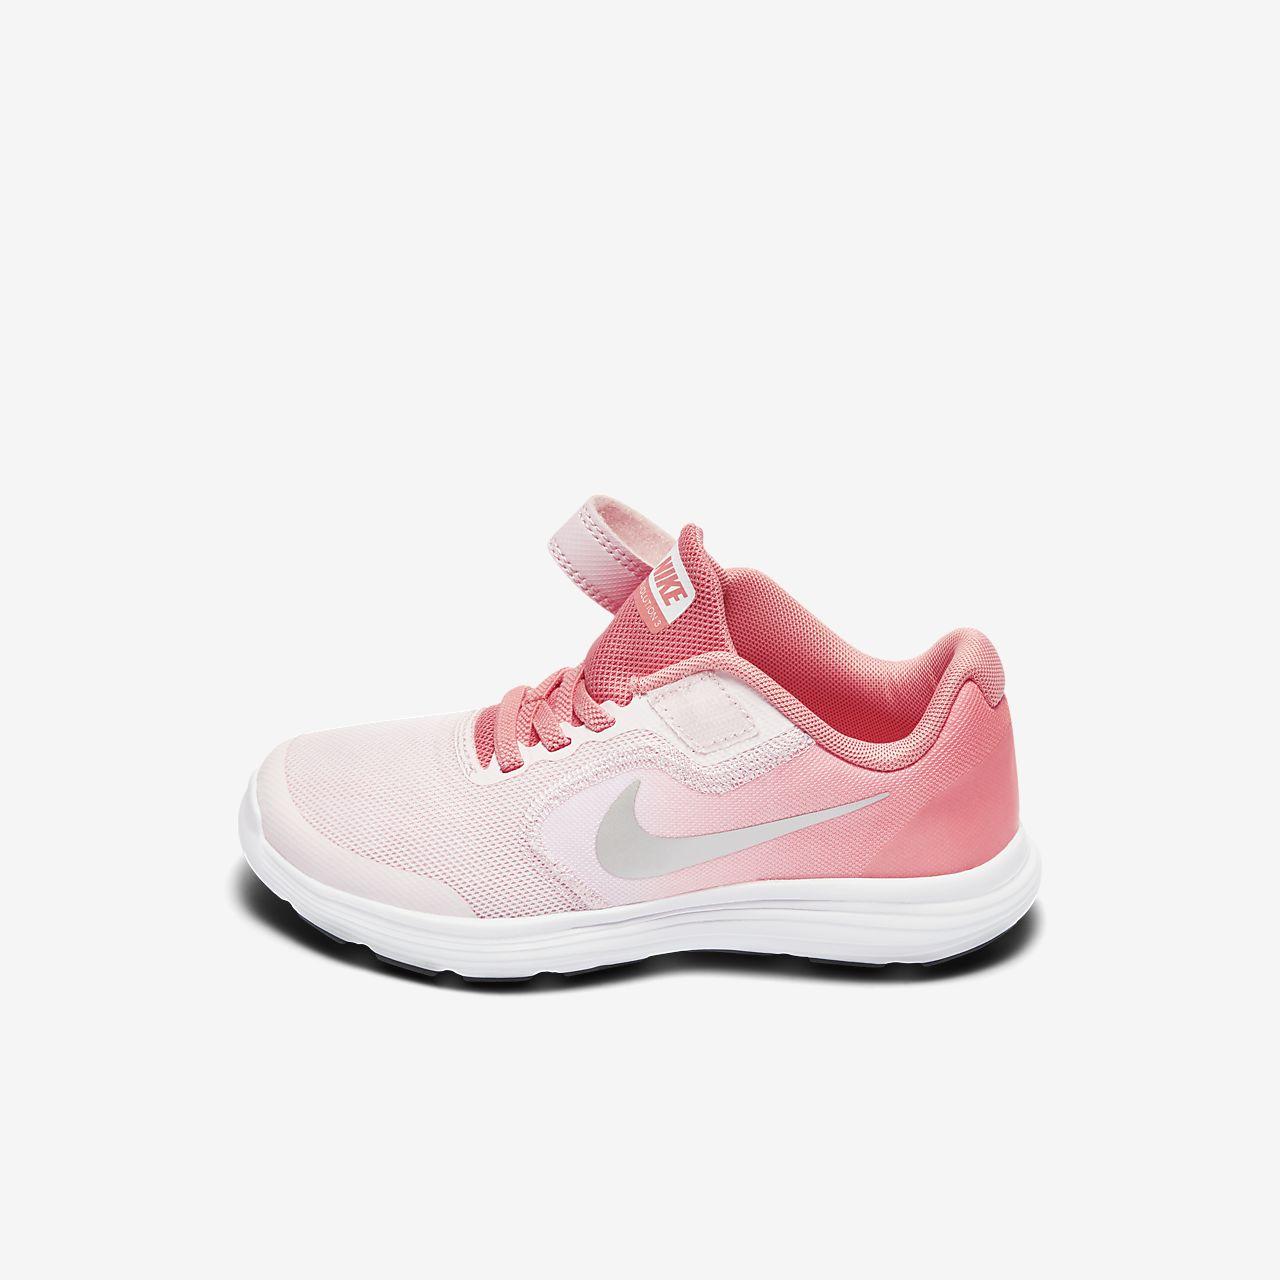 EnfantFr Revolution Nike Running 3 Pour Jeune De Chaussure ChxBsdQtr